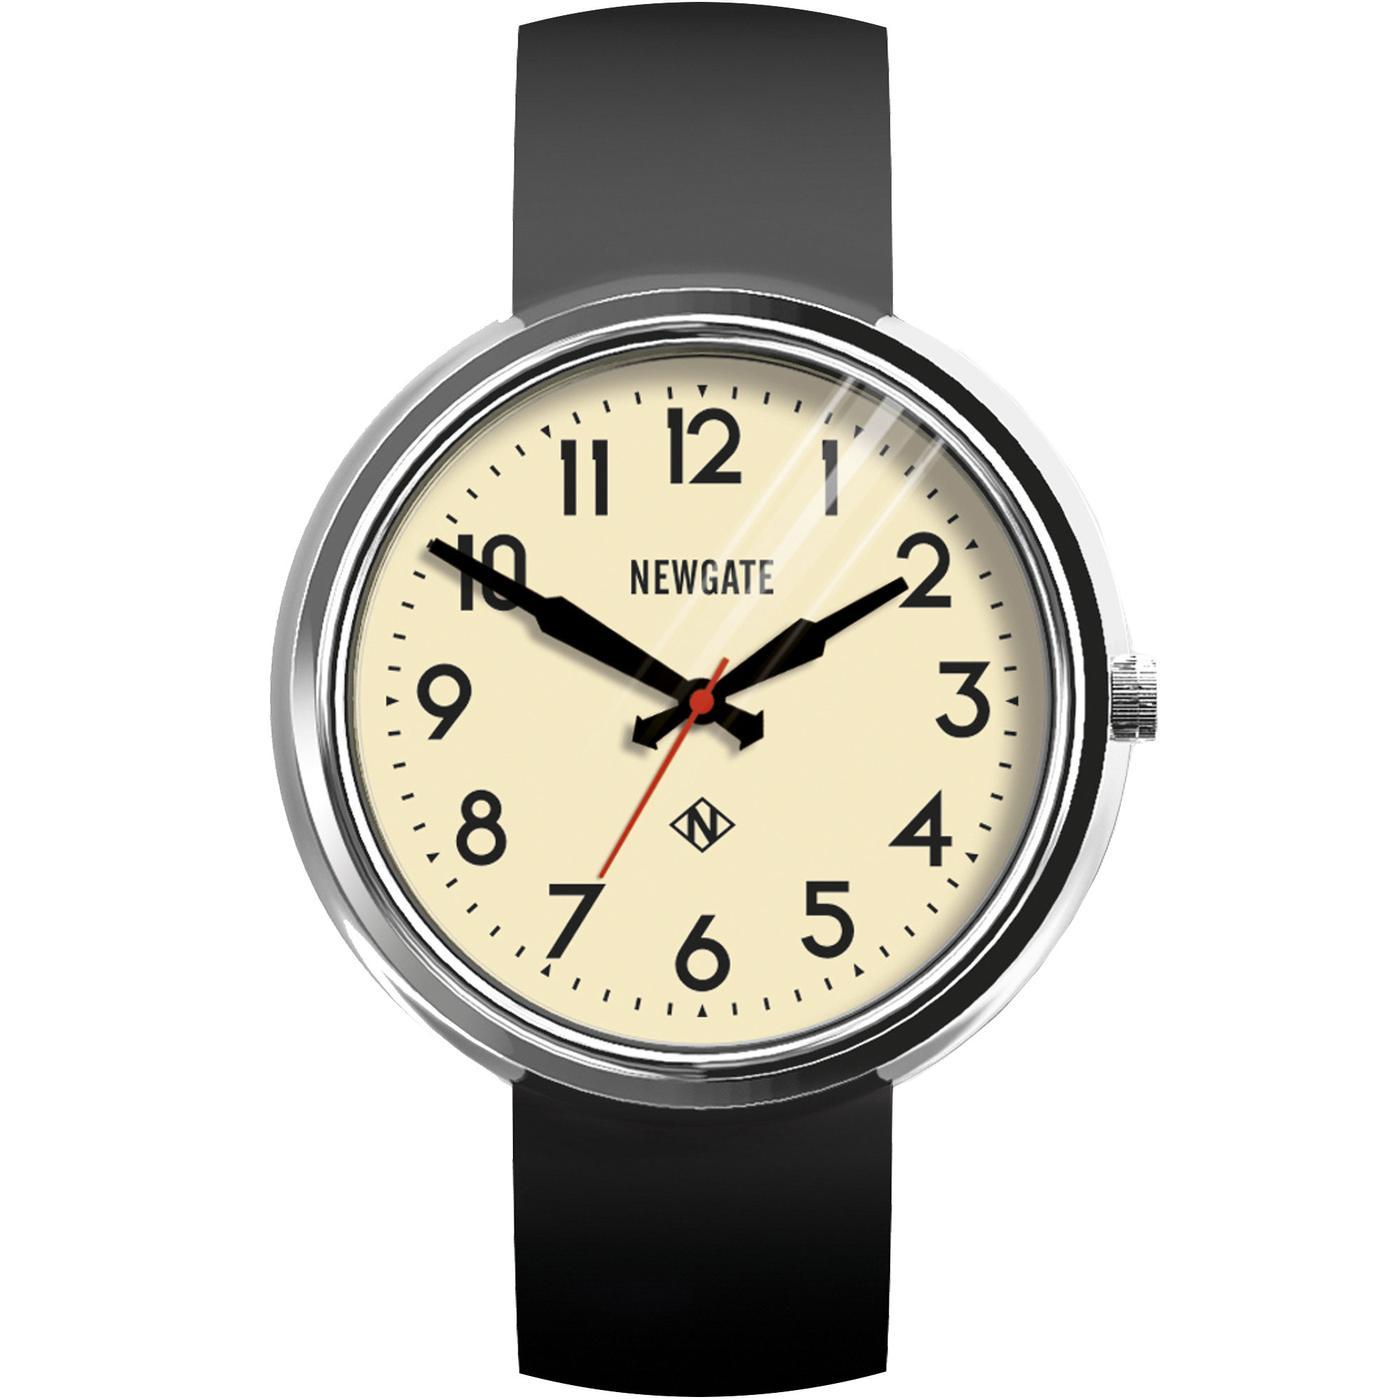 The Electric Grand NEWGATE CLOCKS Retro Watch S